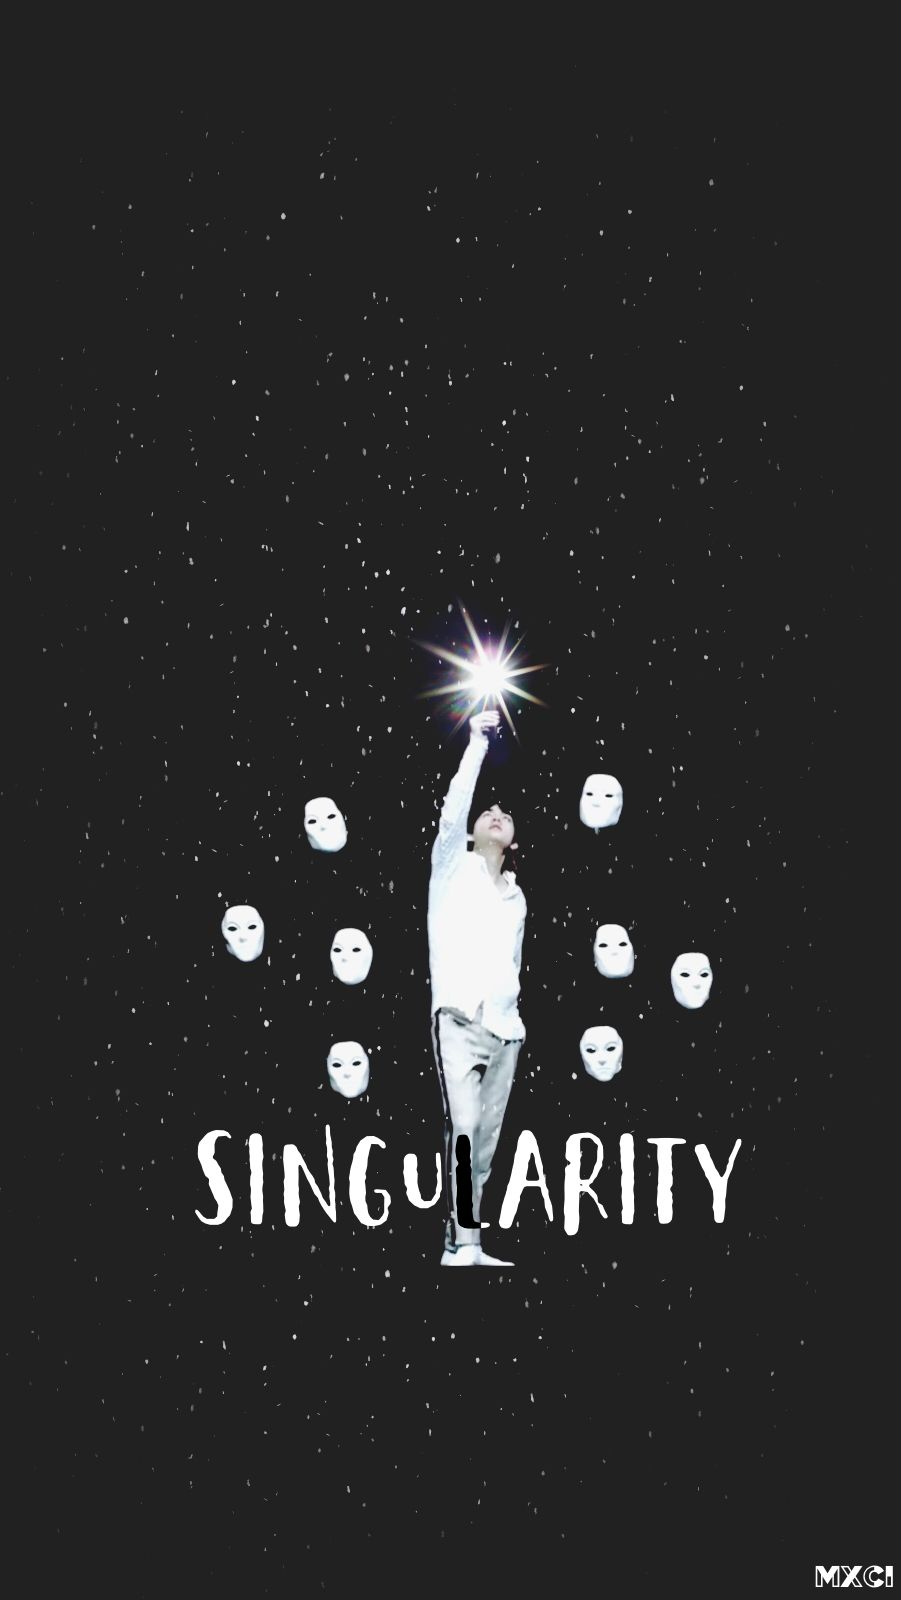 Bts Wallpaper Kimtaehyung Singularity En 2019 Fondo De